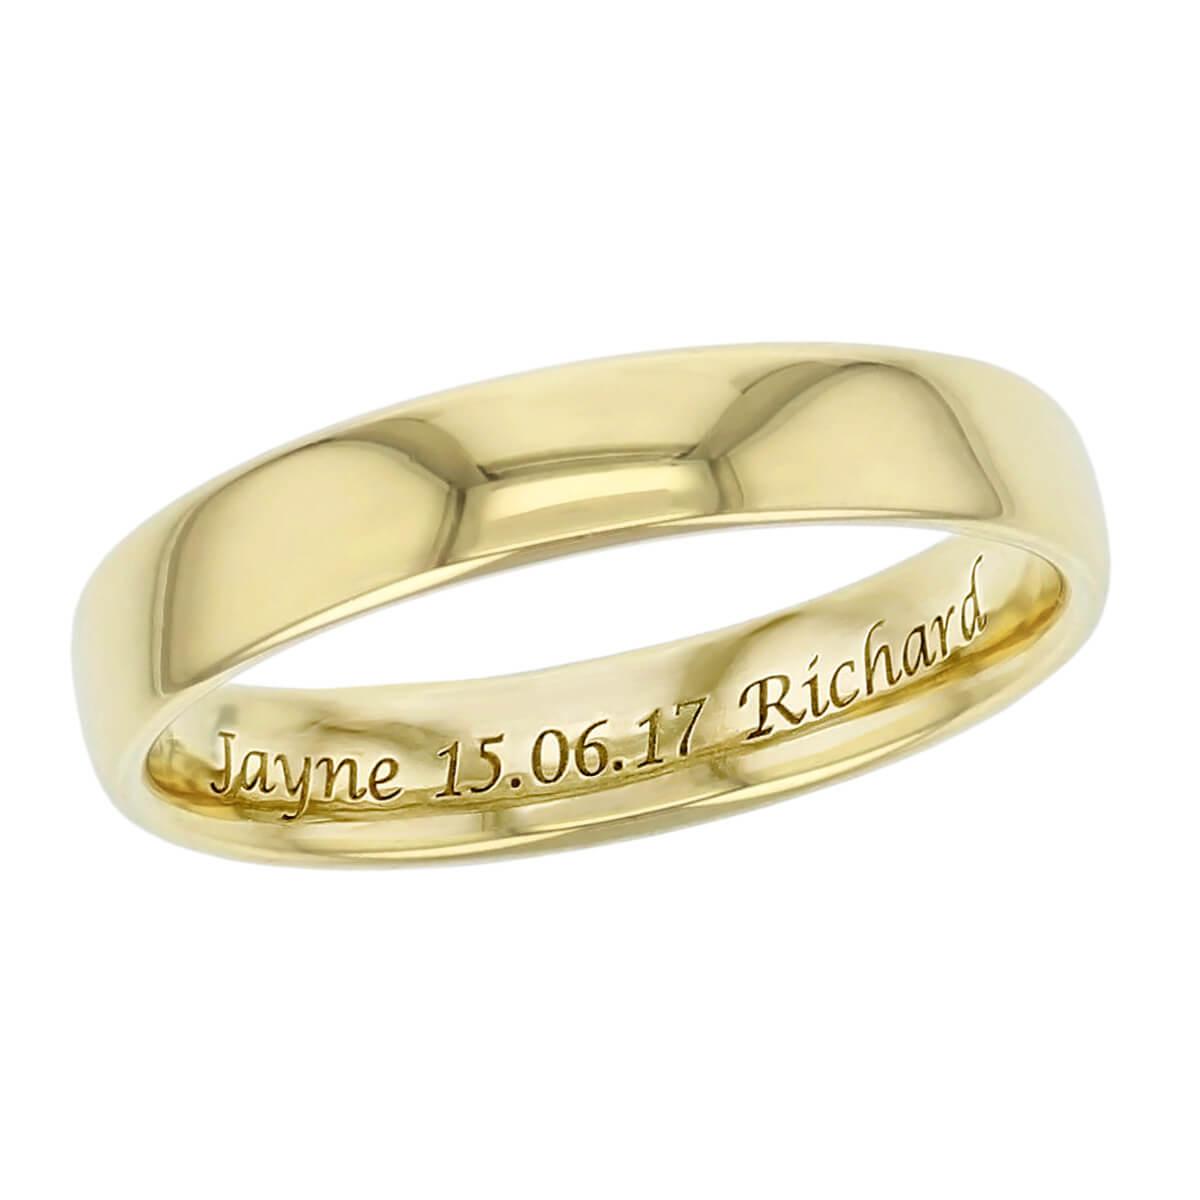 engraving sample, wedding rings by Faller, Derry Jeweller